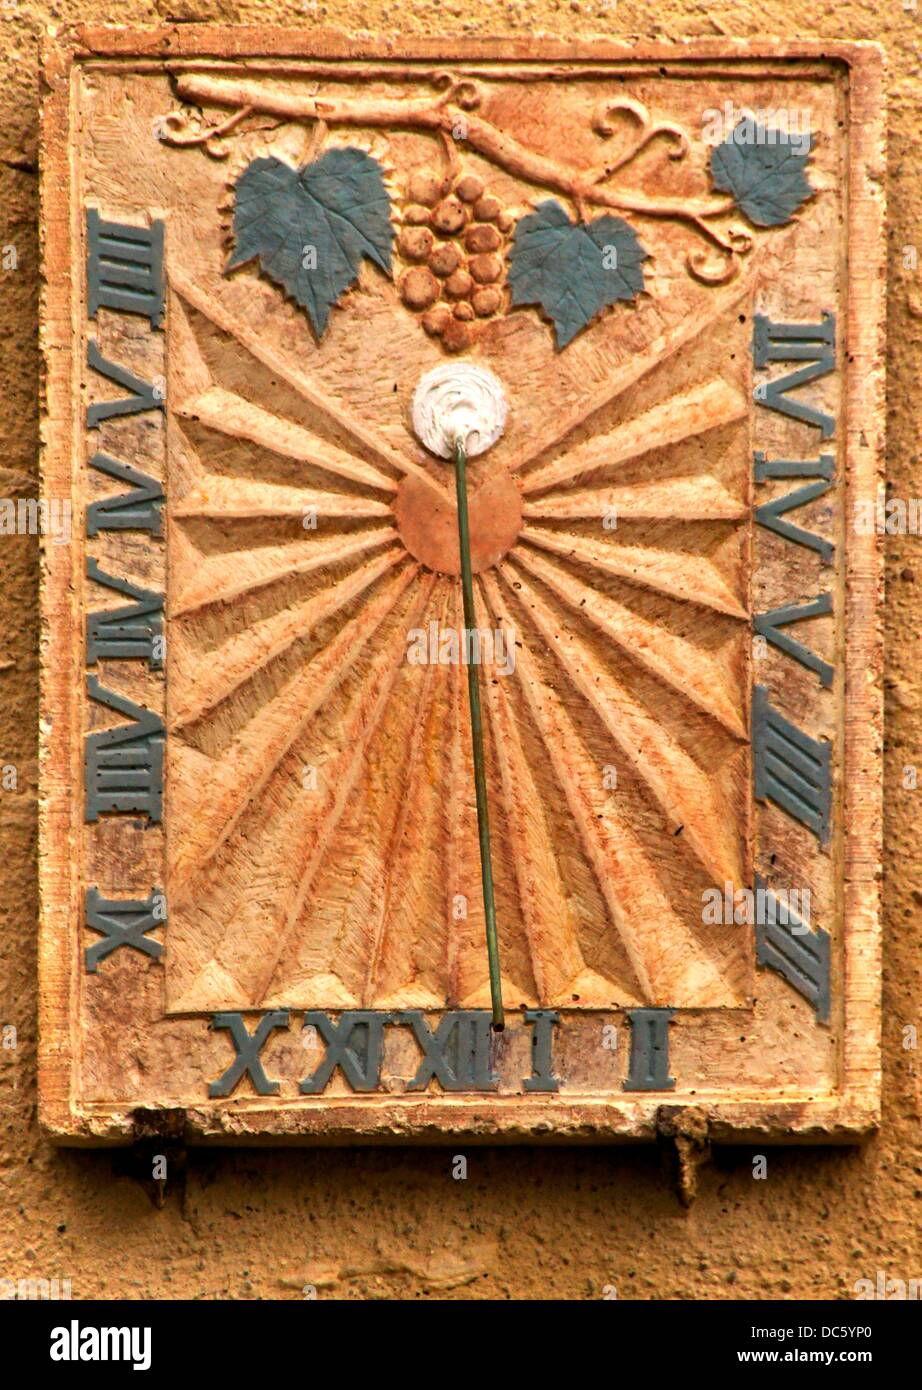 Sun clock with a wine grape motif, at Manciet, Gers, Midi-Pyrenees, France - Stock Image